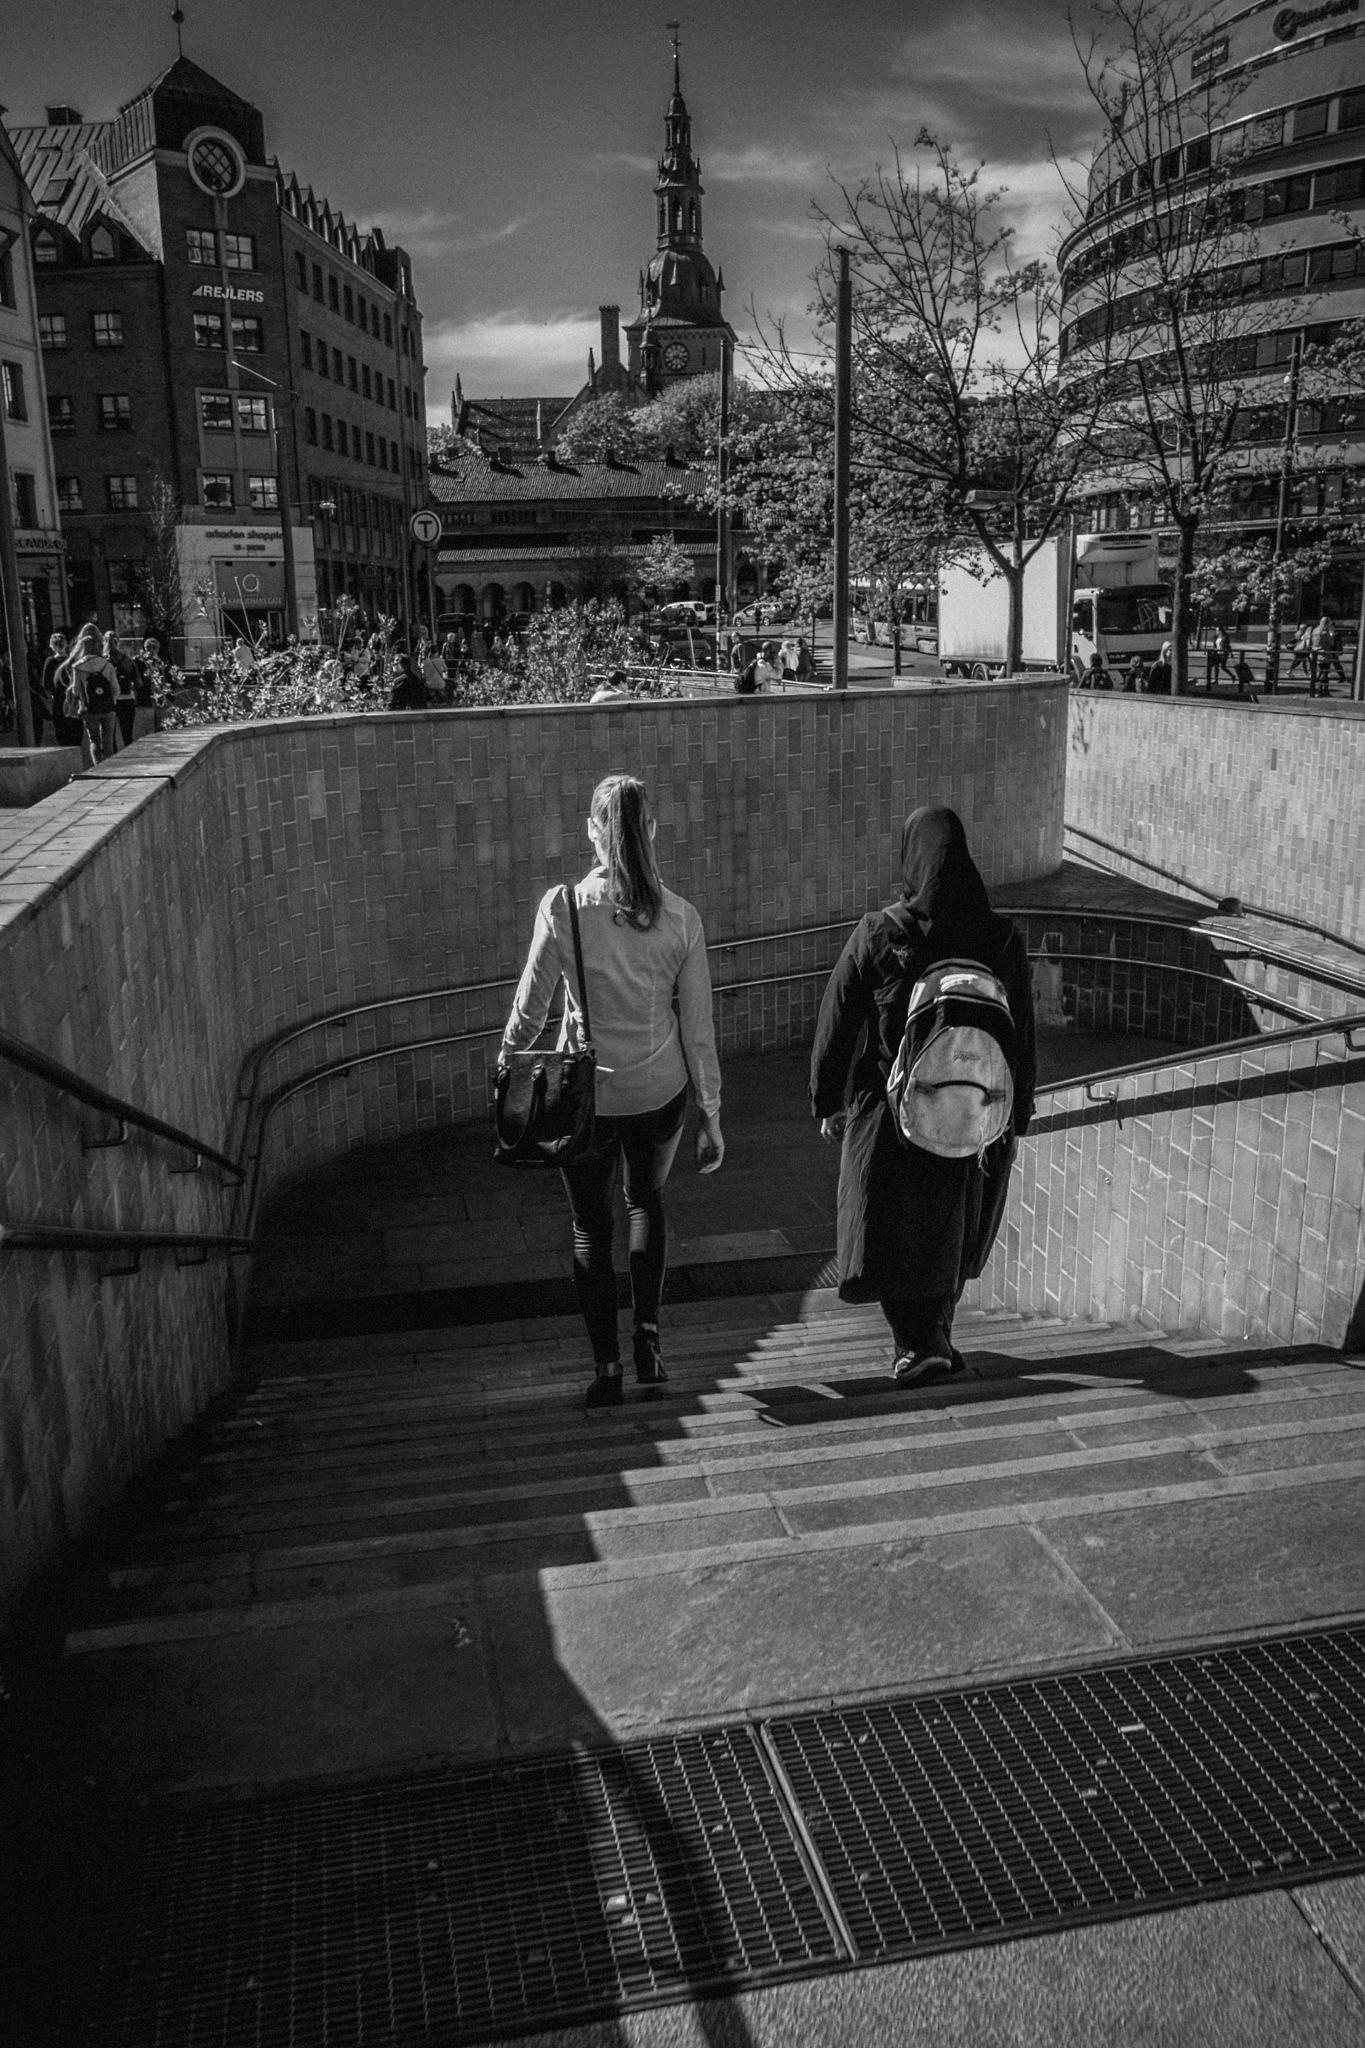 The Clash of Civlizations in Scandinavia ? by Goran Jorganovich